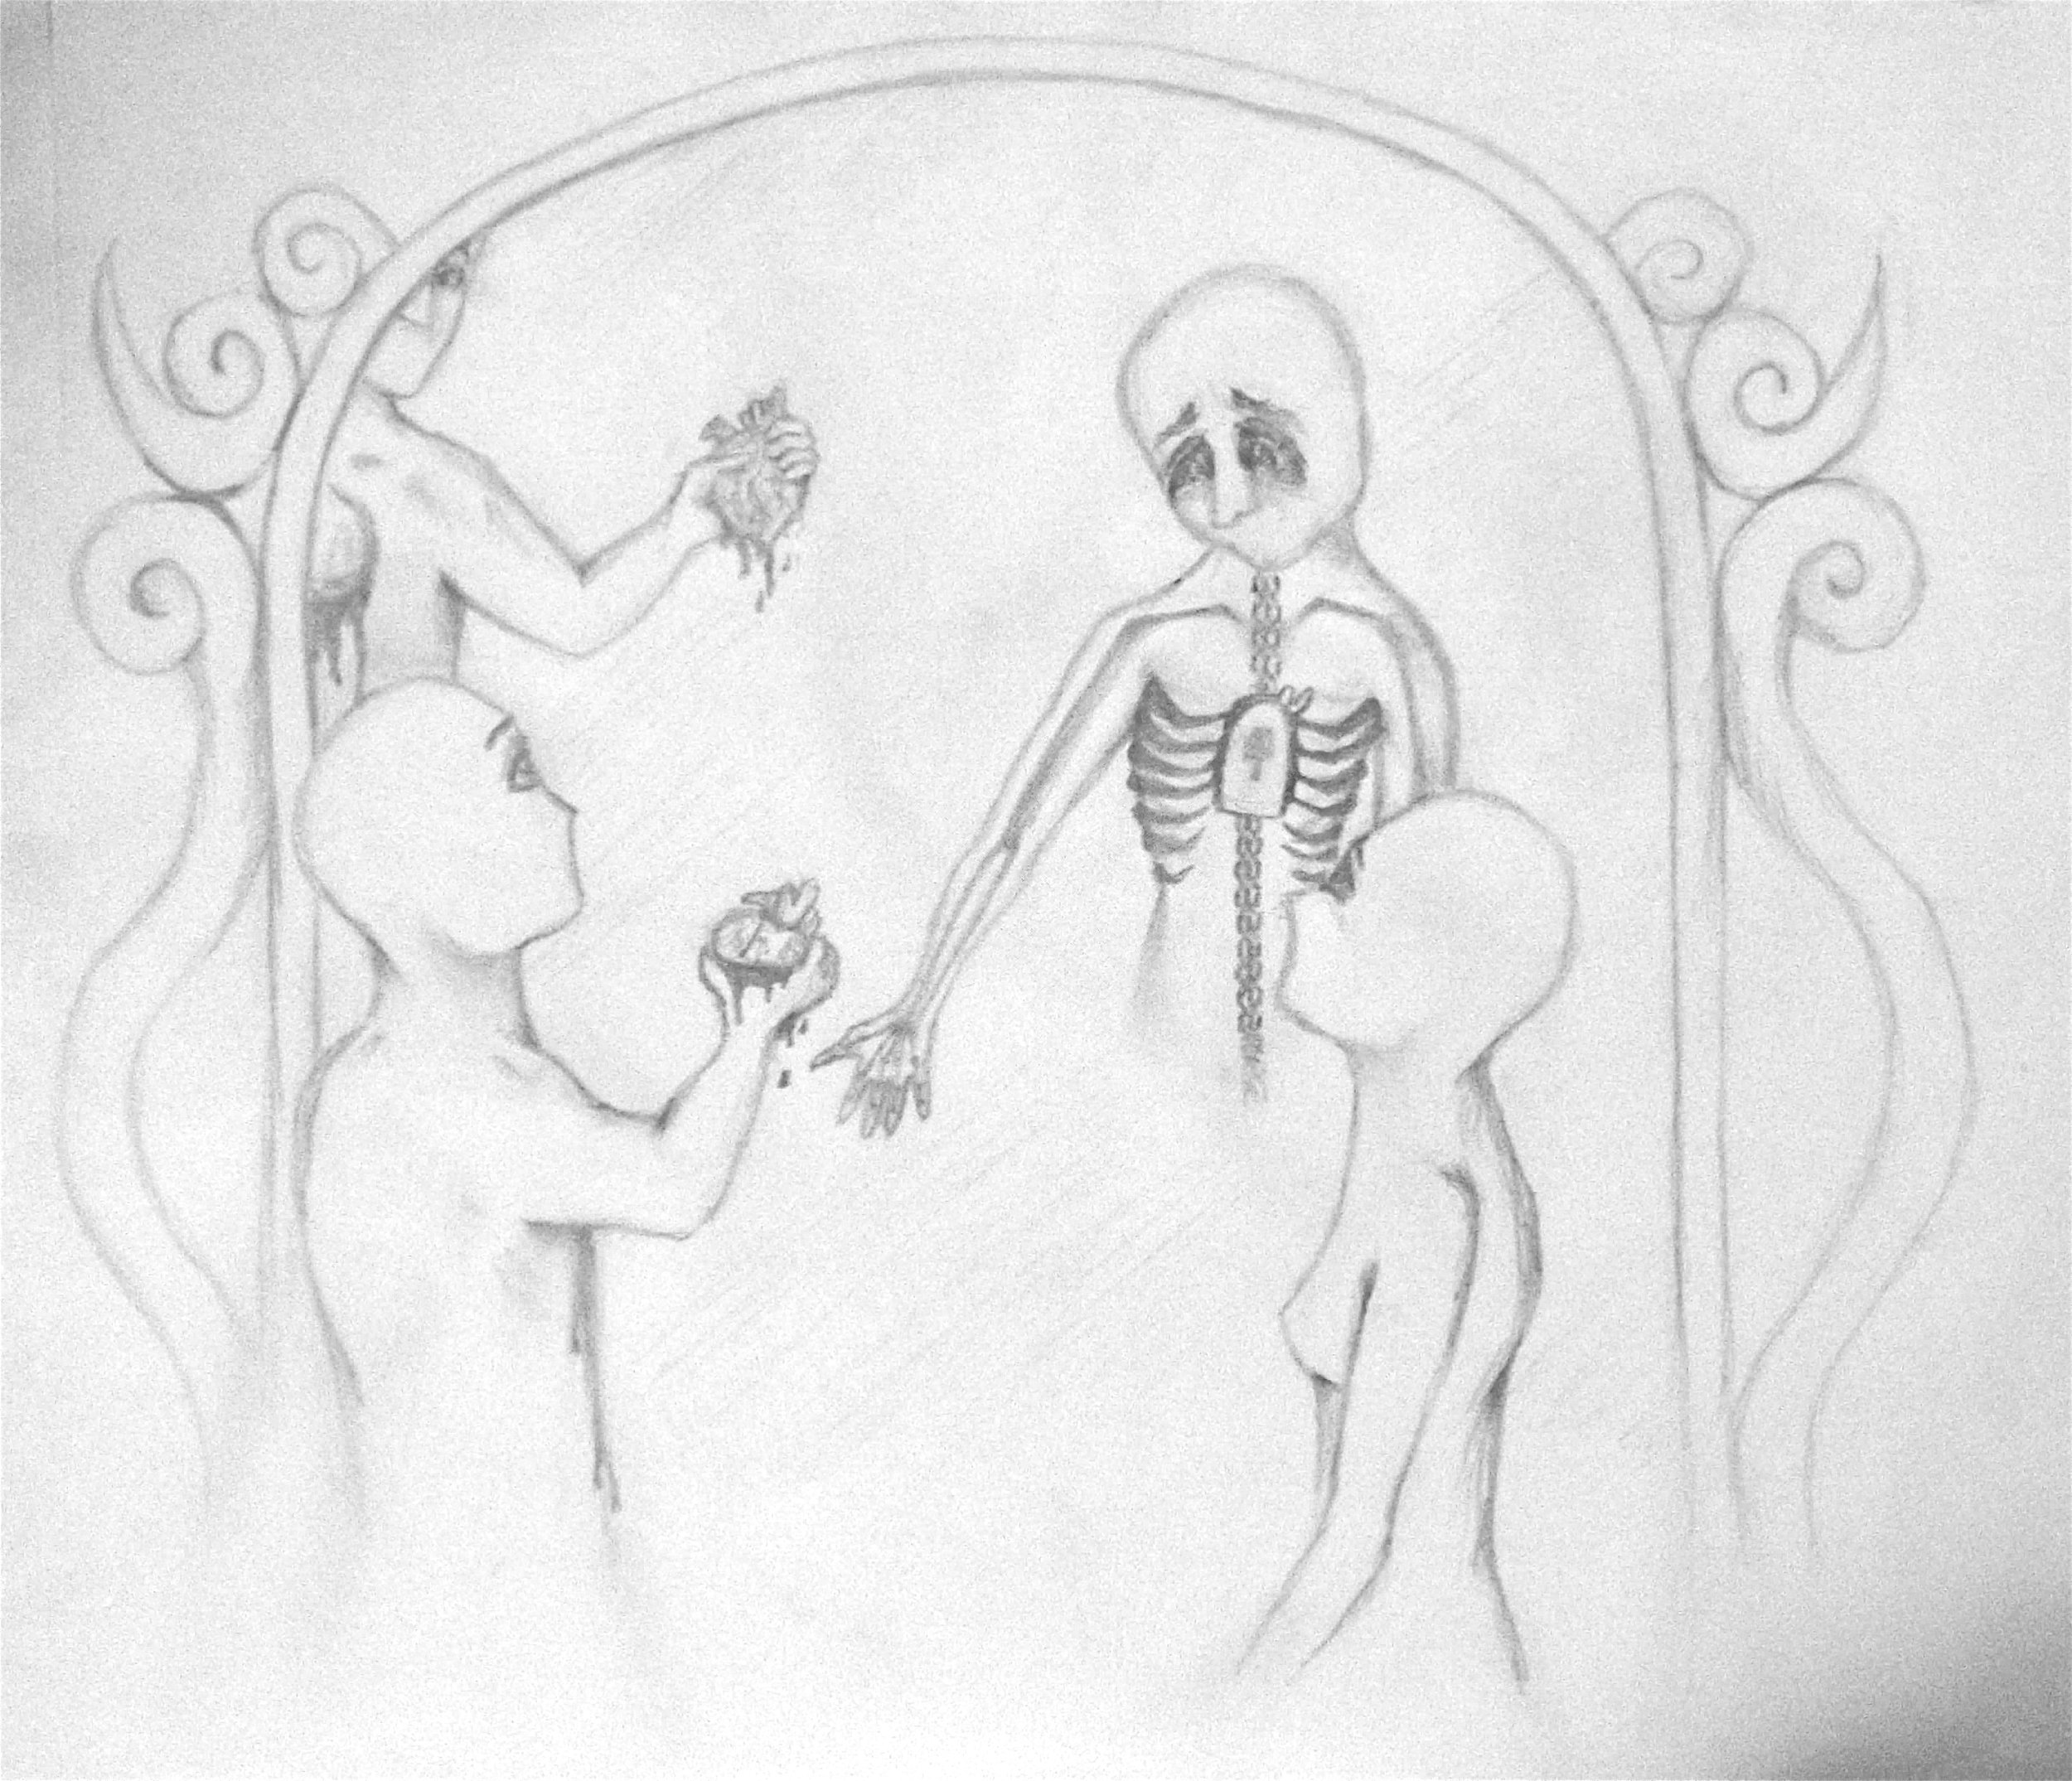 Artwork by Keara O'Bryen